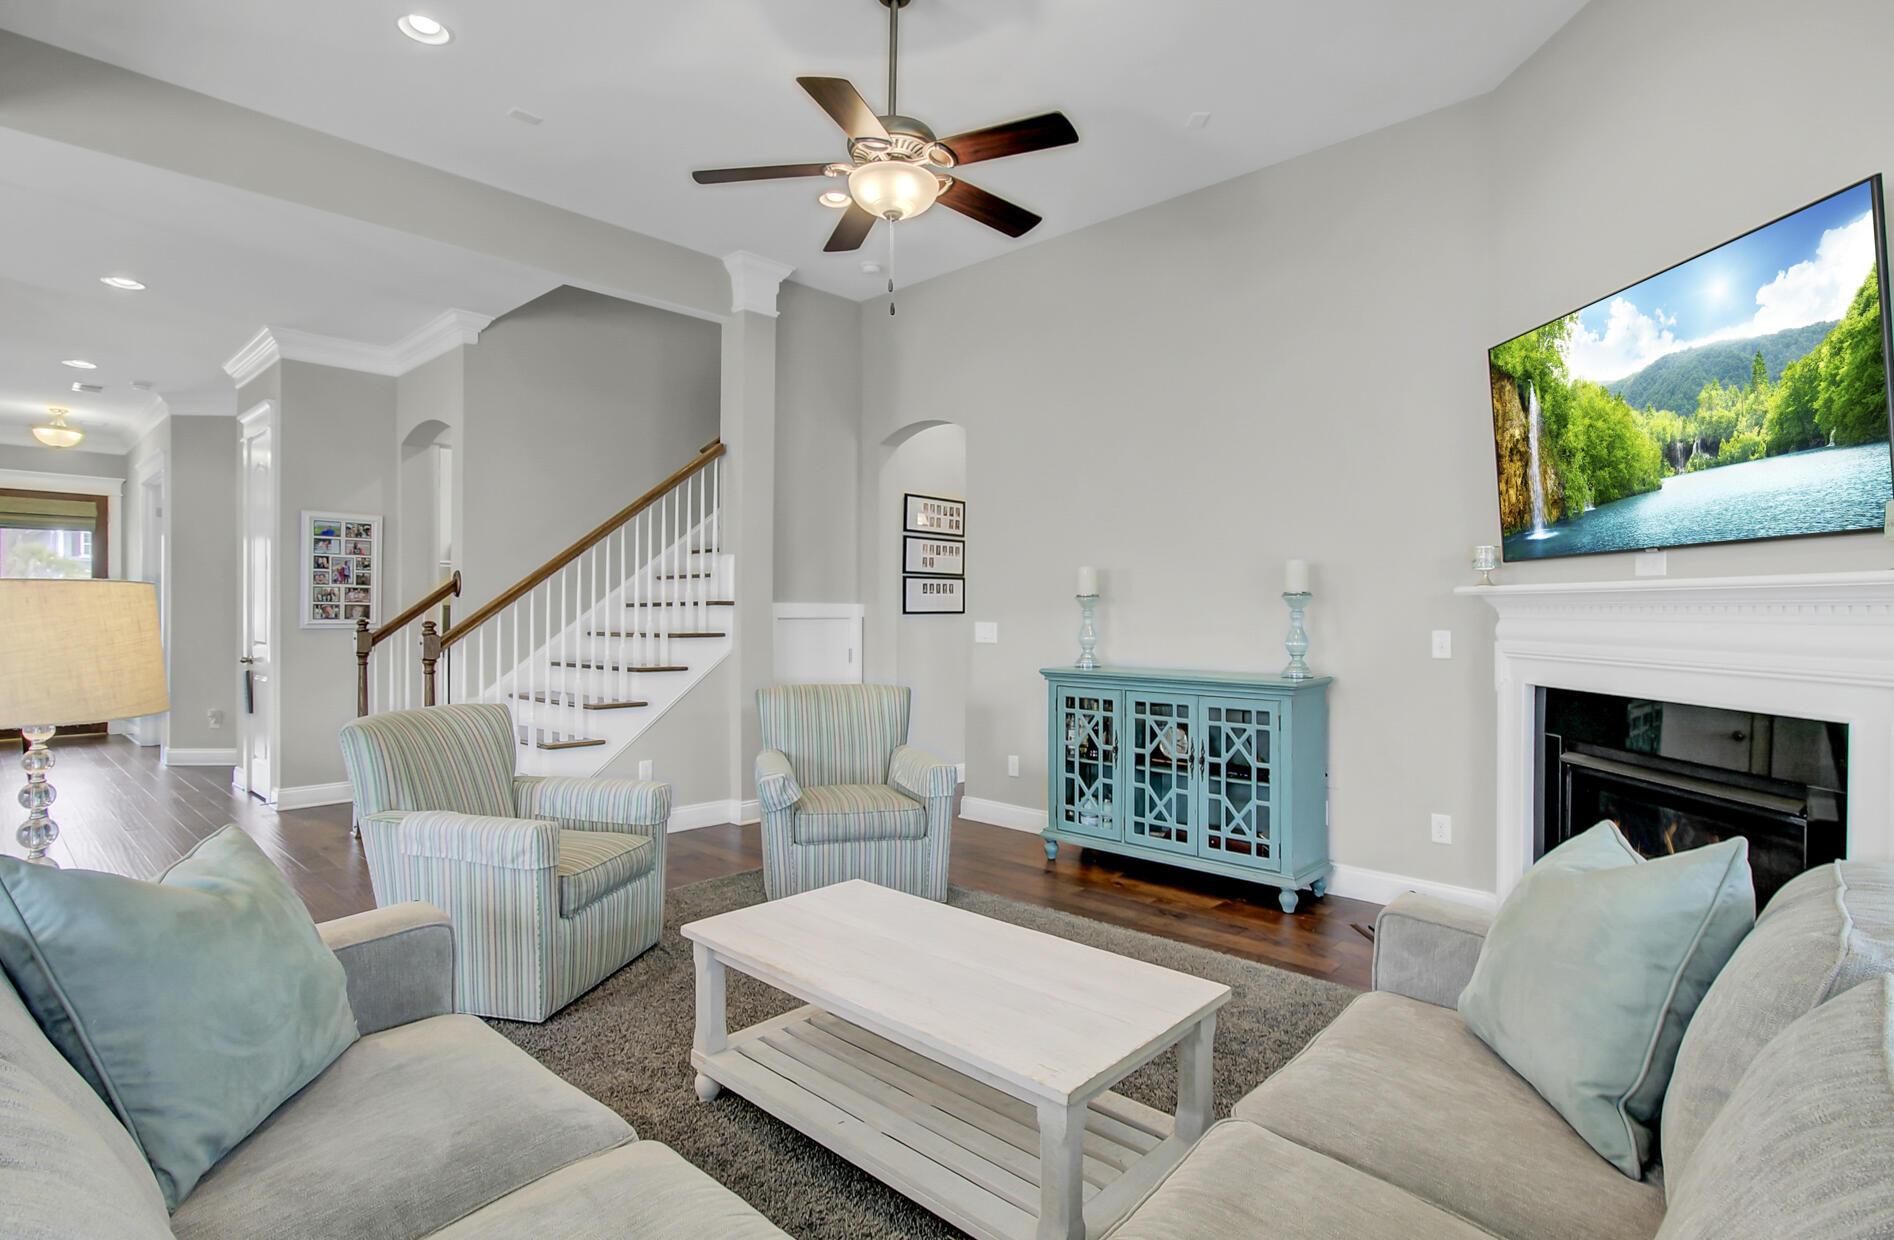 Carolina Park Homes For Sale - 1538 New Chapel, Mount Pleasant, SC - 2